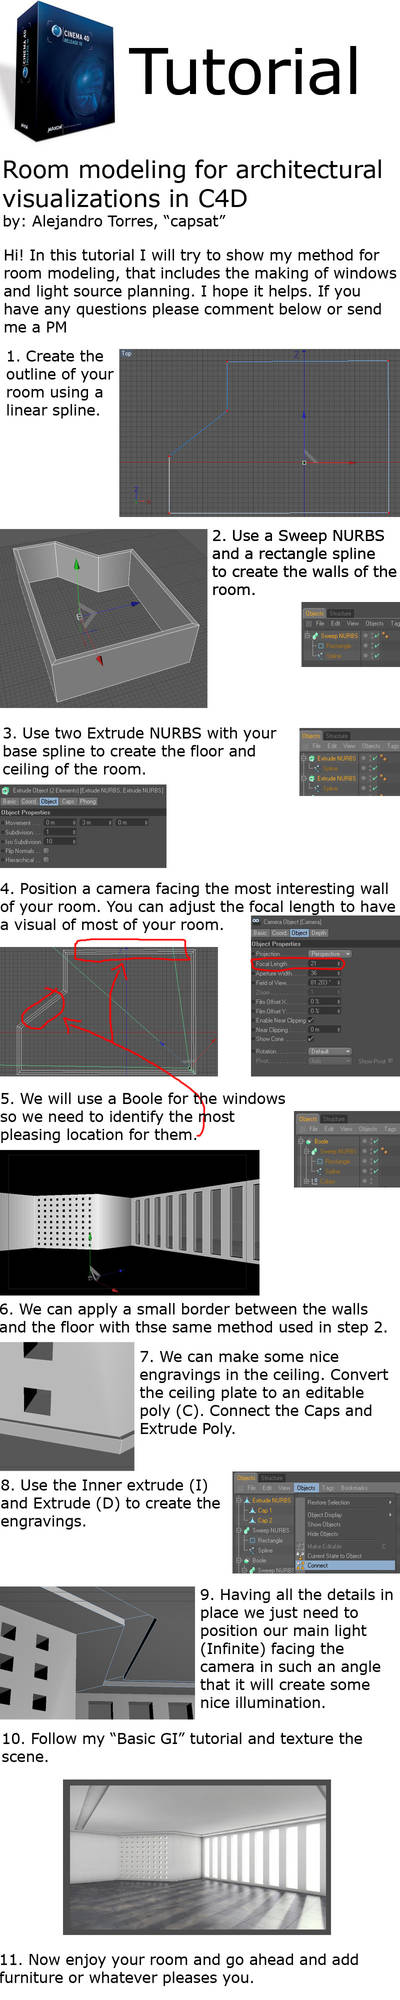 Room Modeling C4D tutorial R10 by capsat